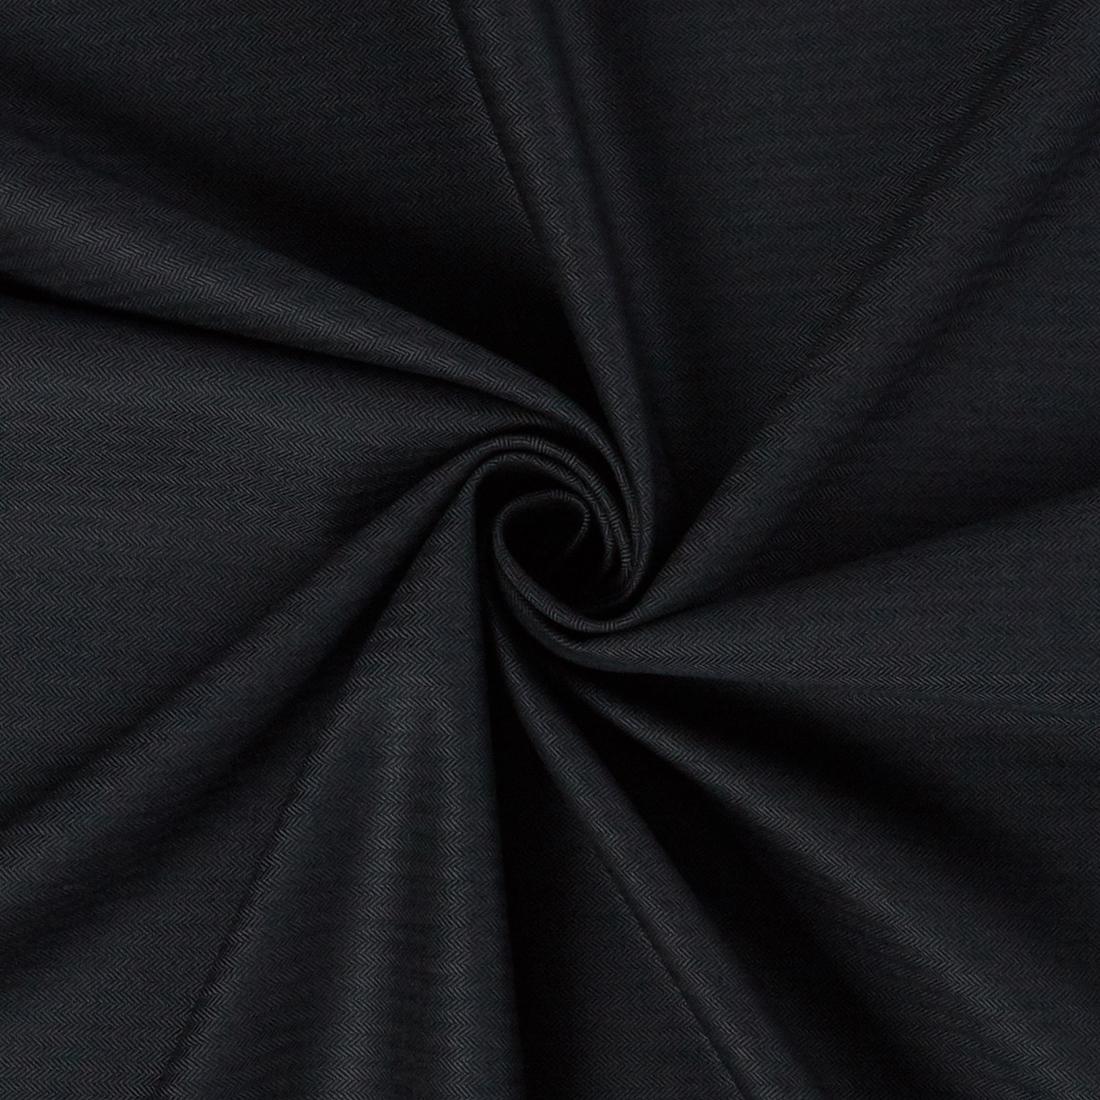 Herringbone Wool Suiting Charcoal Dress Fabric